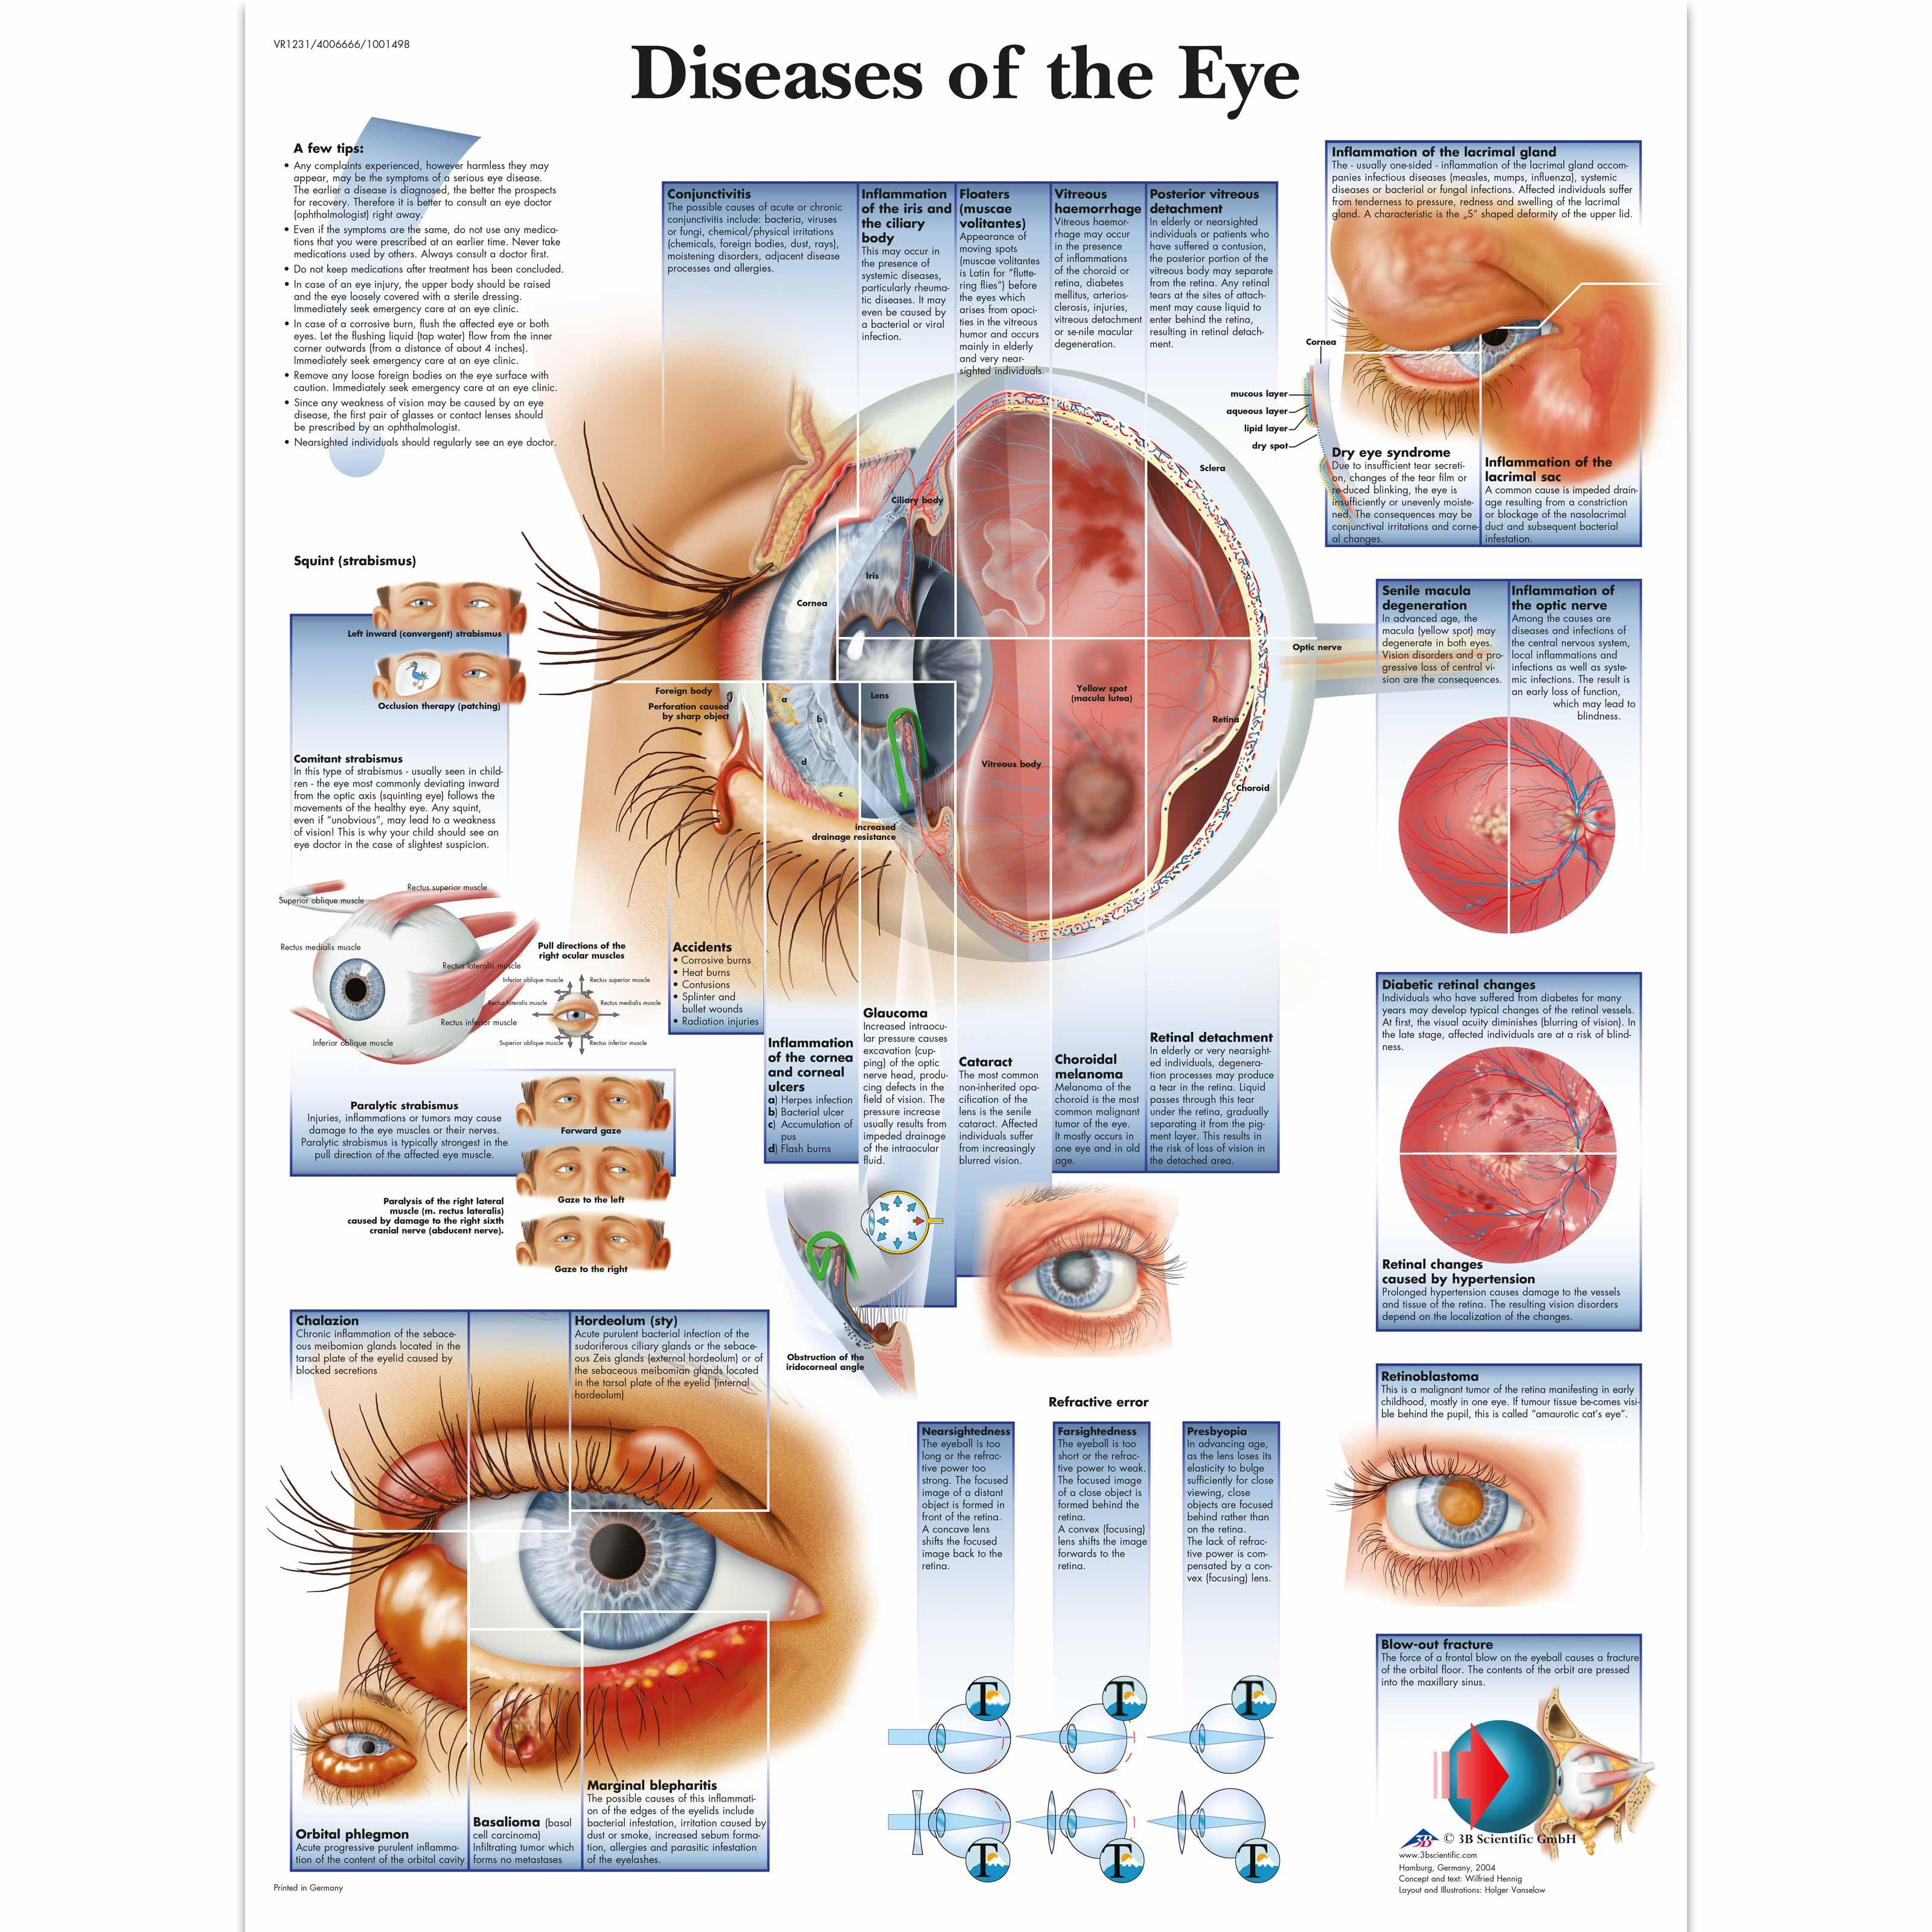 Diseases of the eye chart 4006666 vr1231uu ophthalmology 3b diseases of the eye chart geenschuldenfo Choice Image